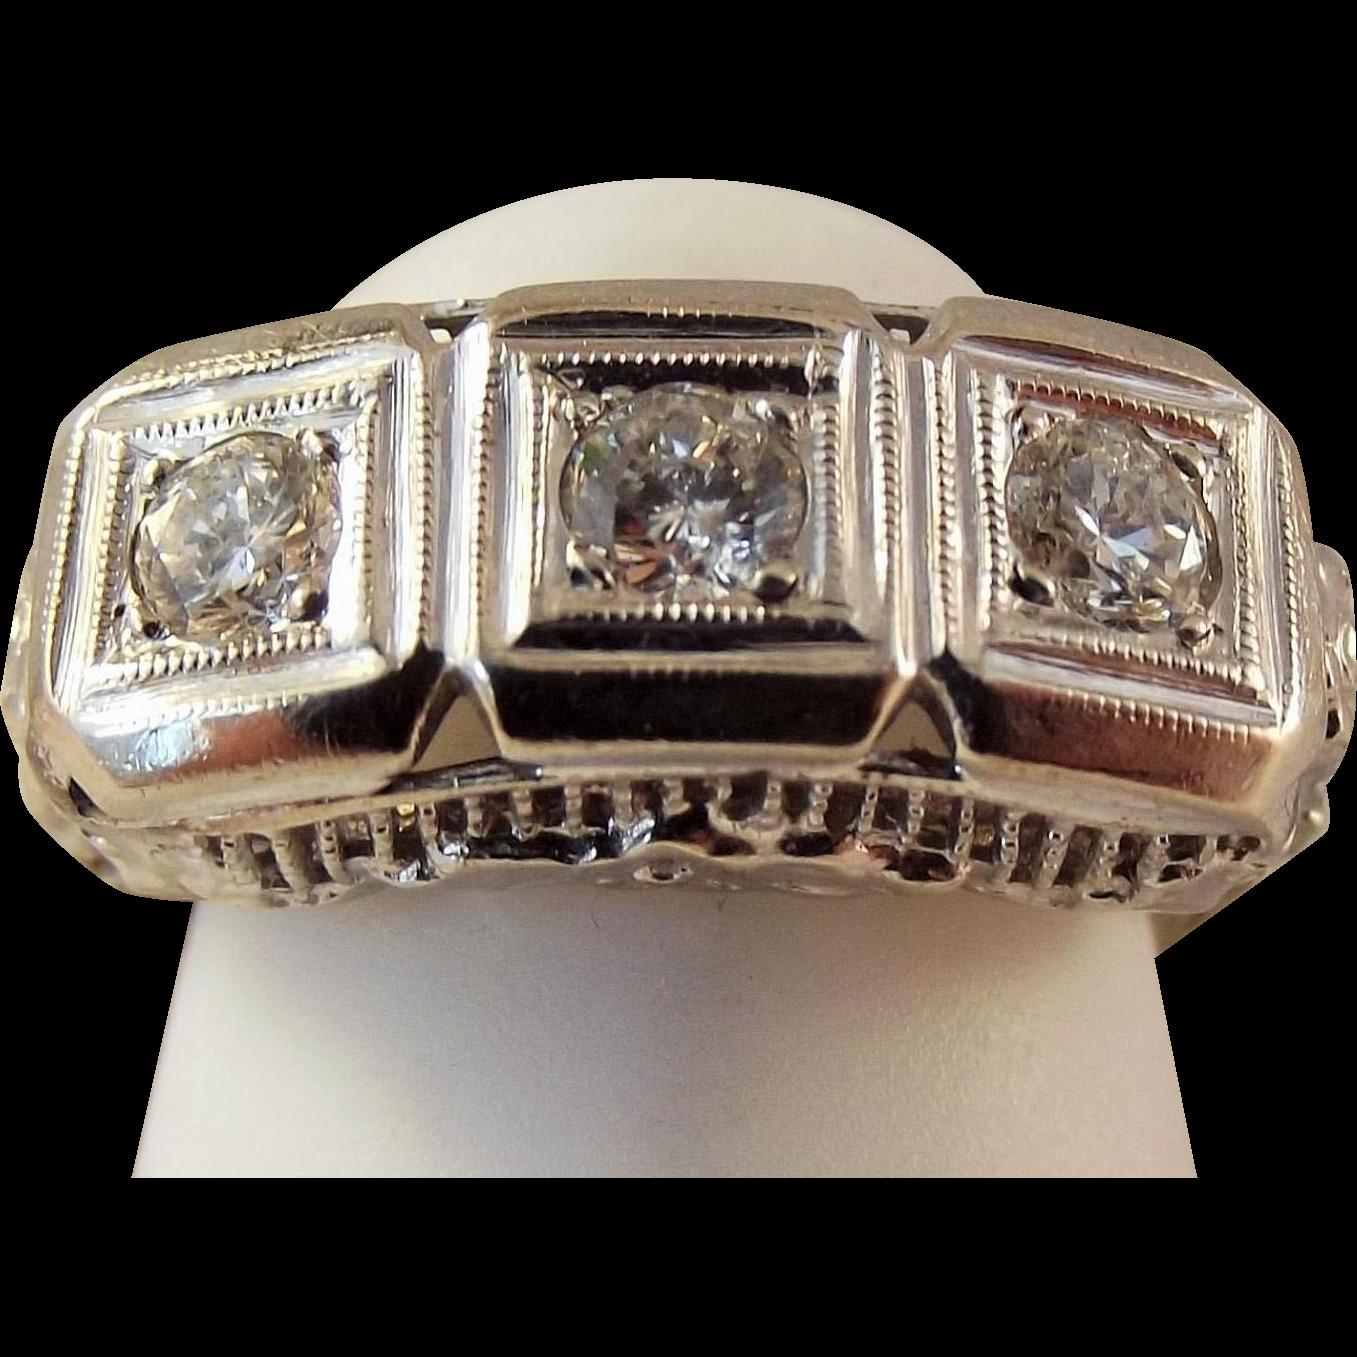 68% Off 14k Art Deco 75 ctw Diamond Filigree Ring